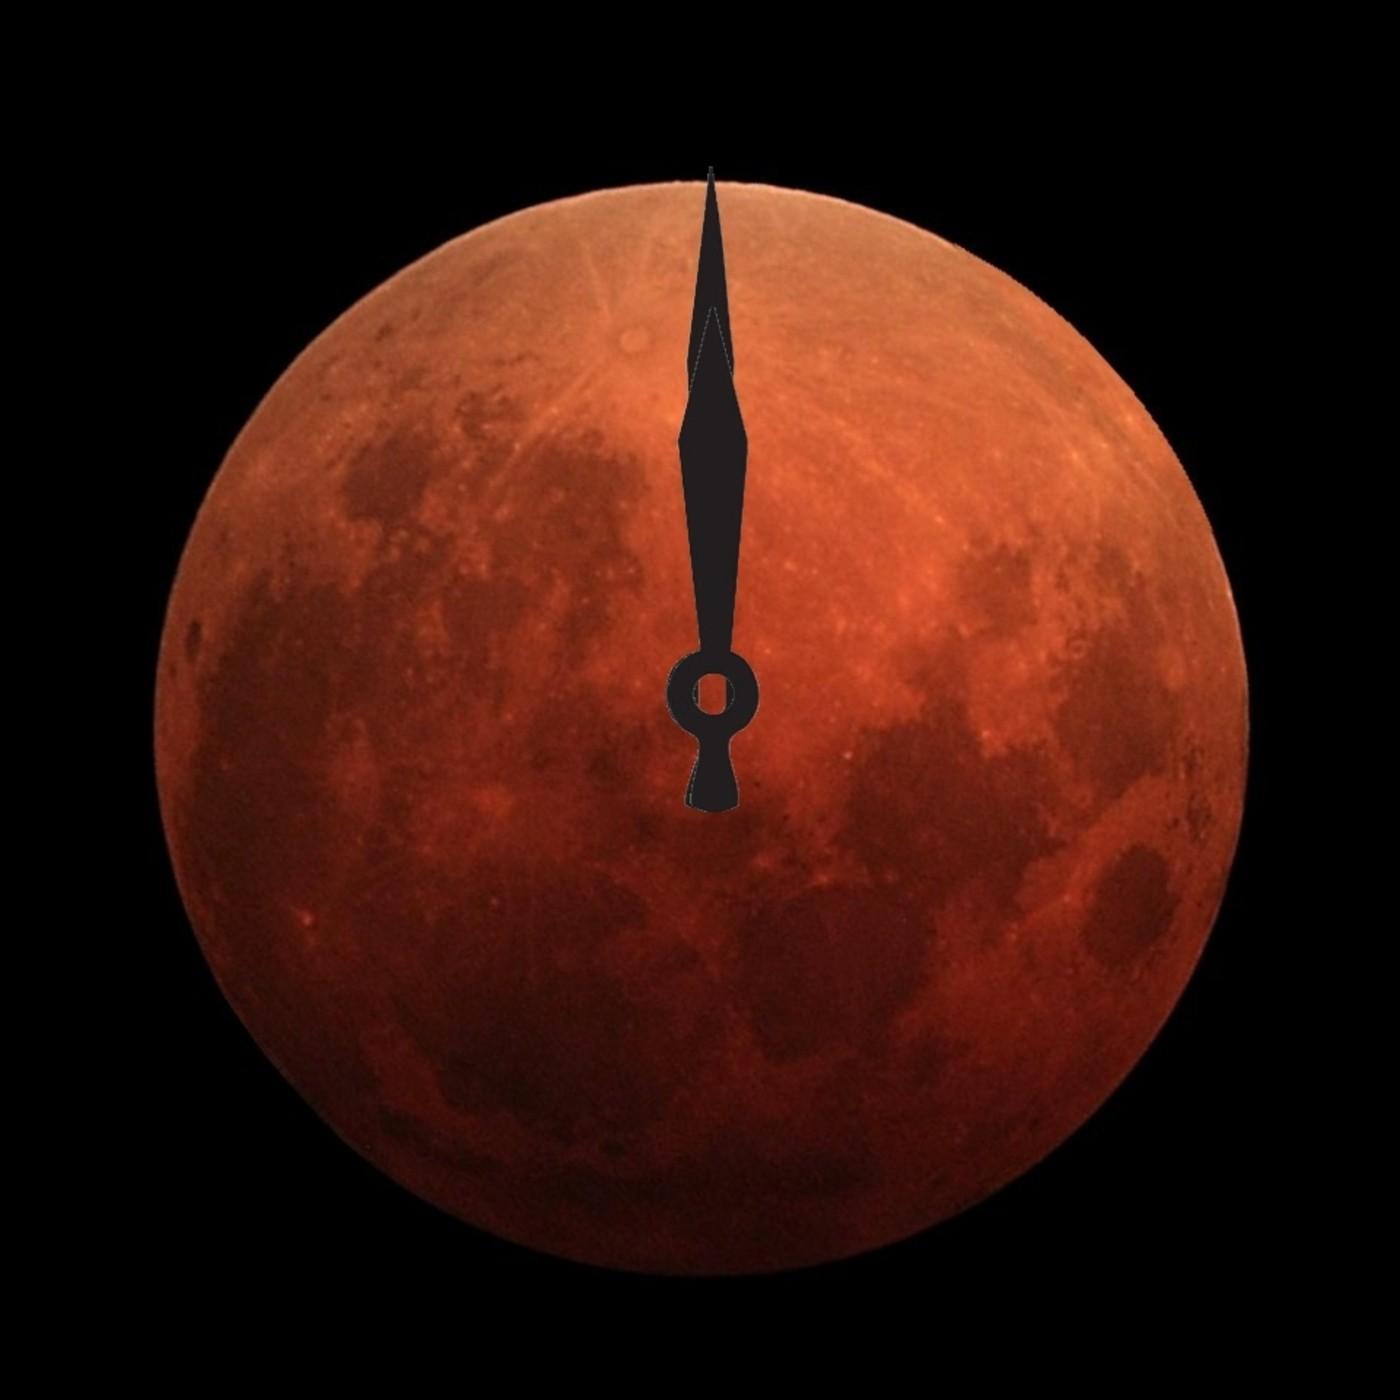 Notas de Medianoche 18: InSight en Marte, Arte de IA, OSIRIS-REx en Bennu, Esqueleto en el Támesis.